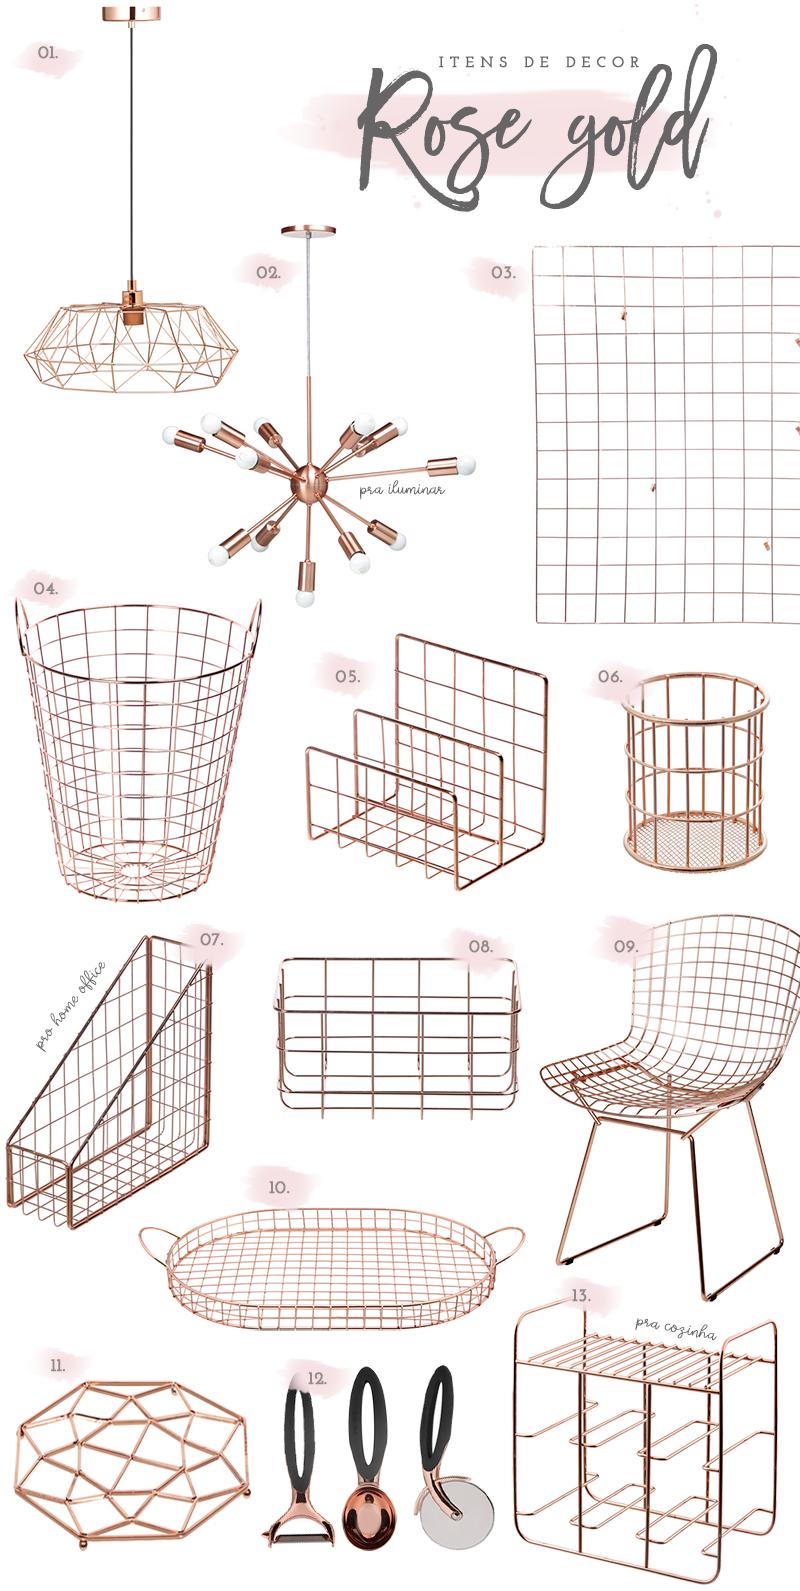 onde comprar acess rios em rose gold para decorar a casa. Black Bedroom Furniture Sets. Home Design Ideas